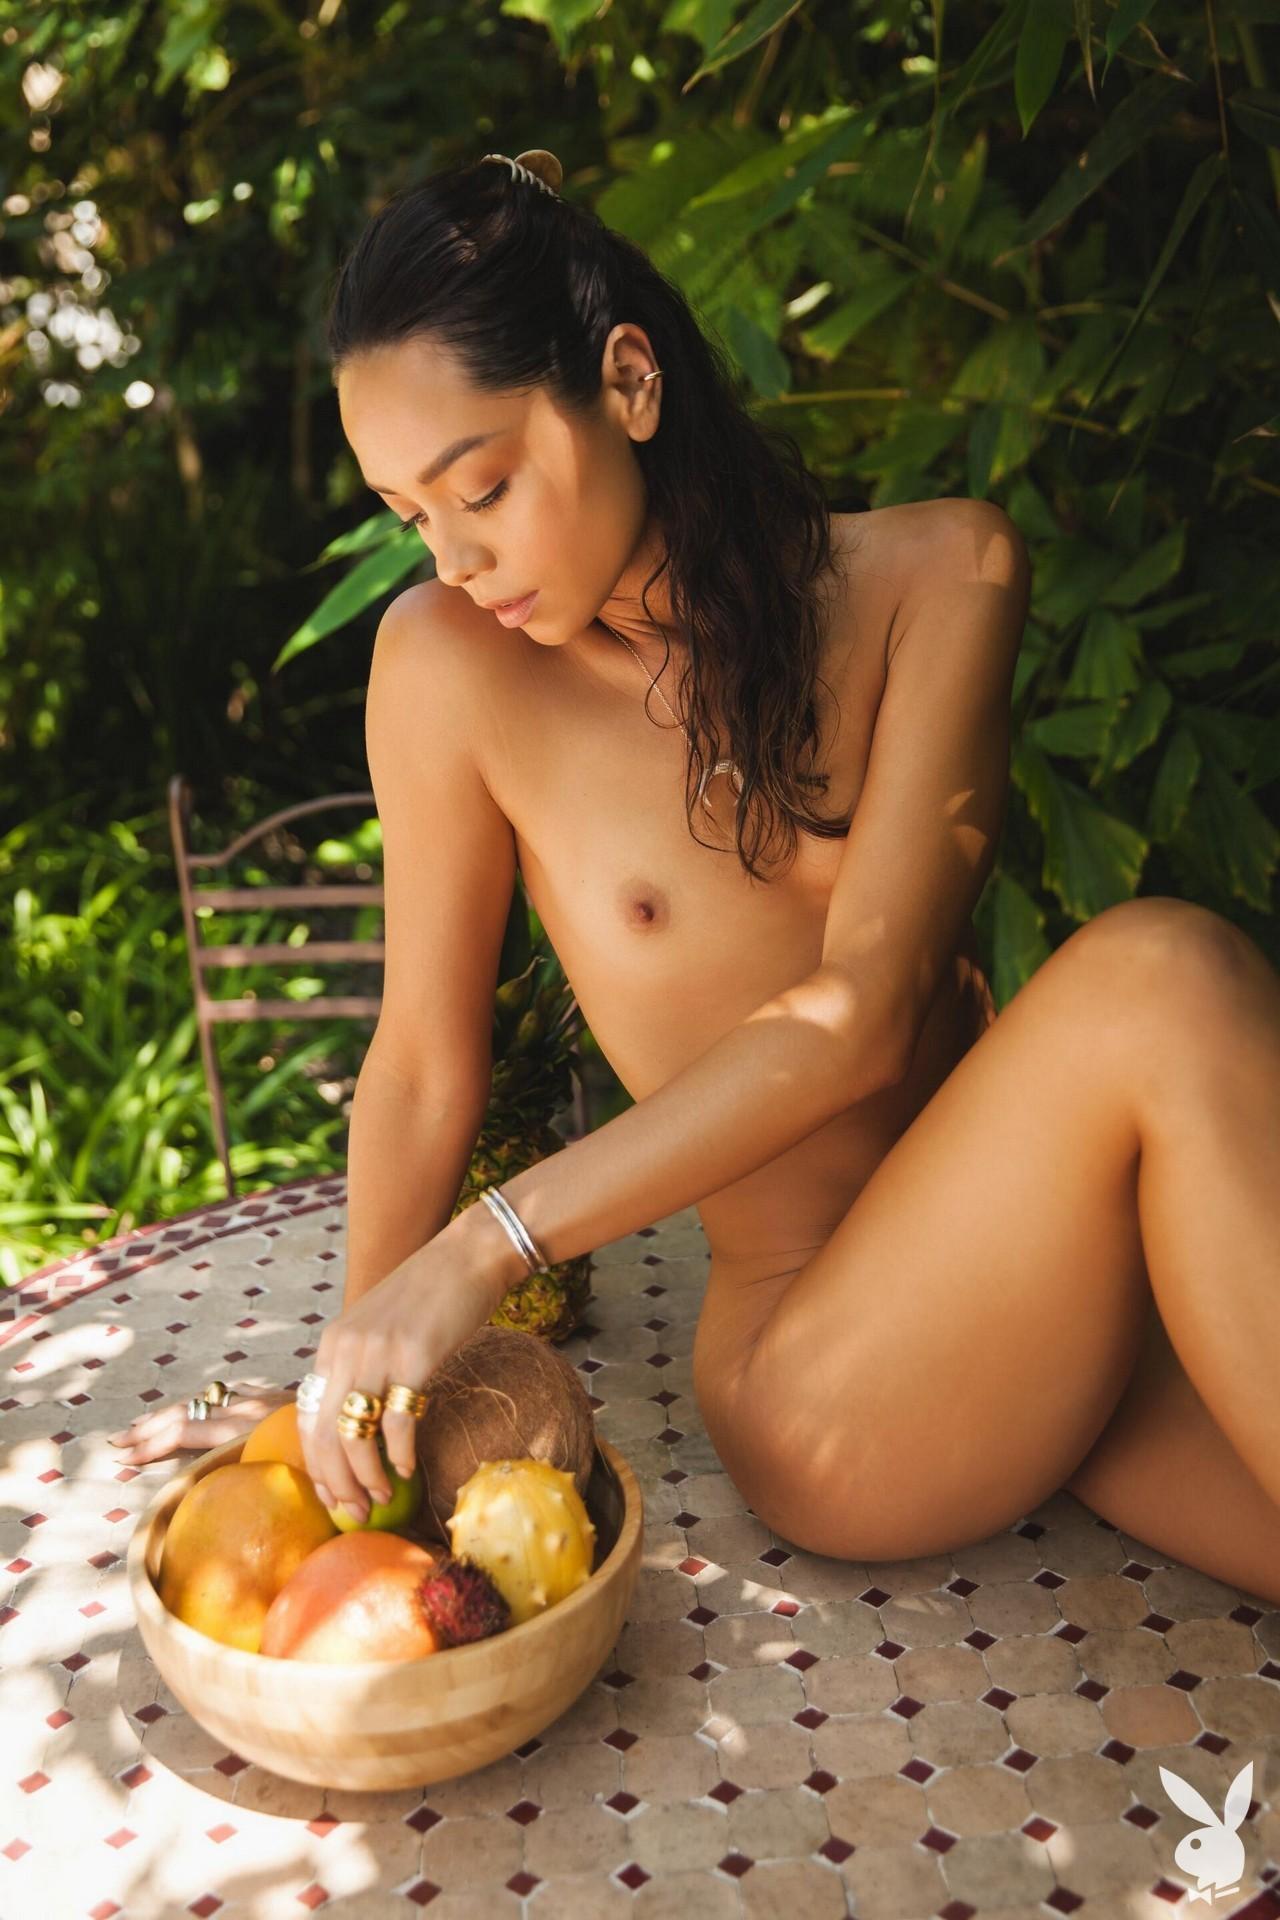 Playmate September 2020 Danielle Alcaraz Playboy Plus (26)